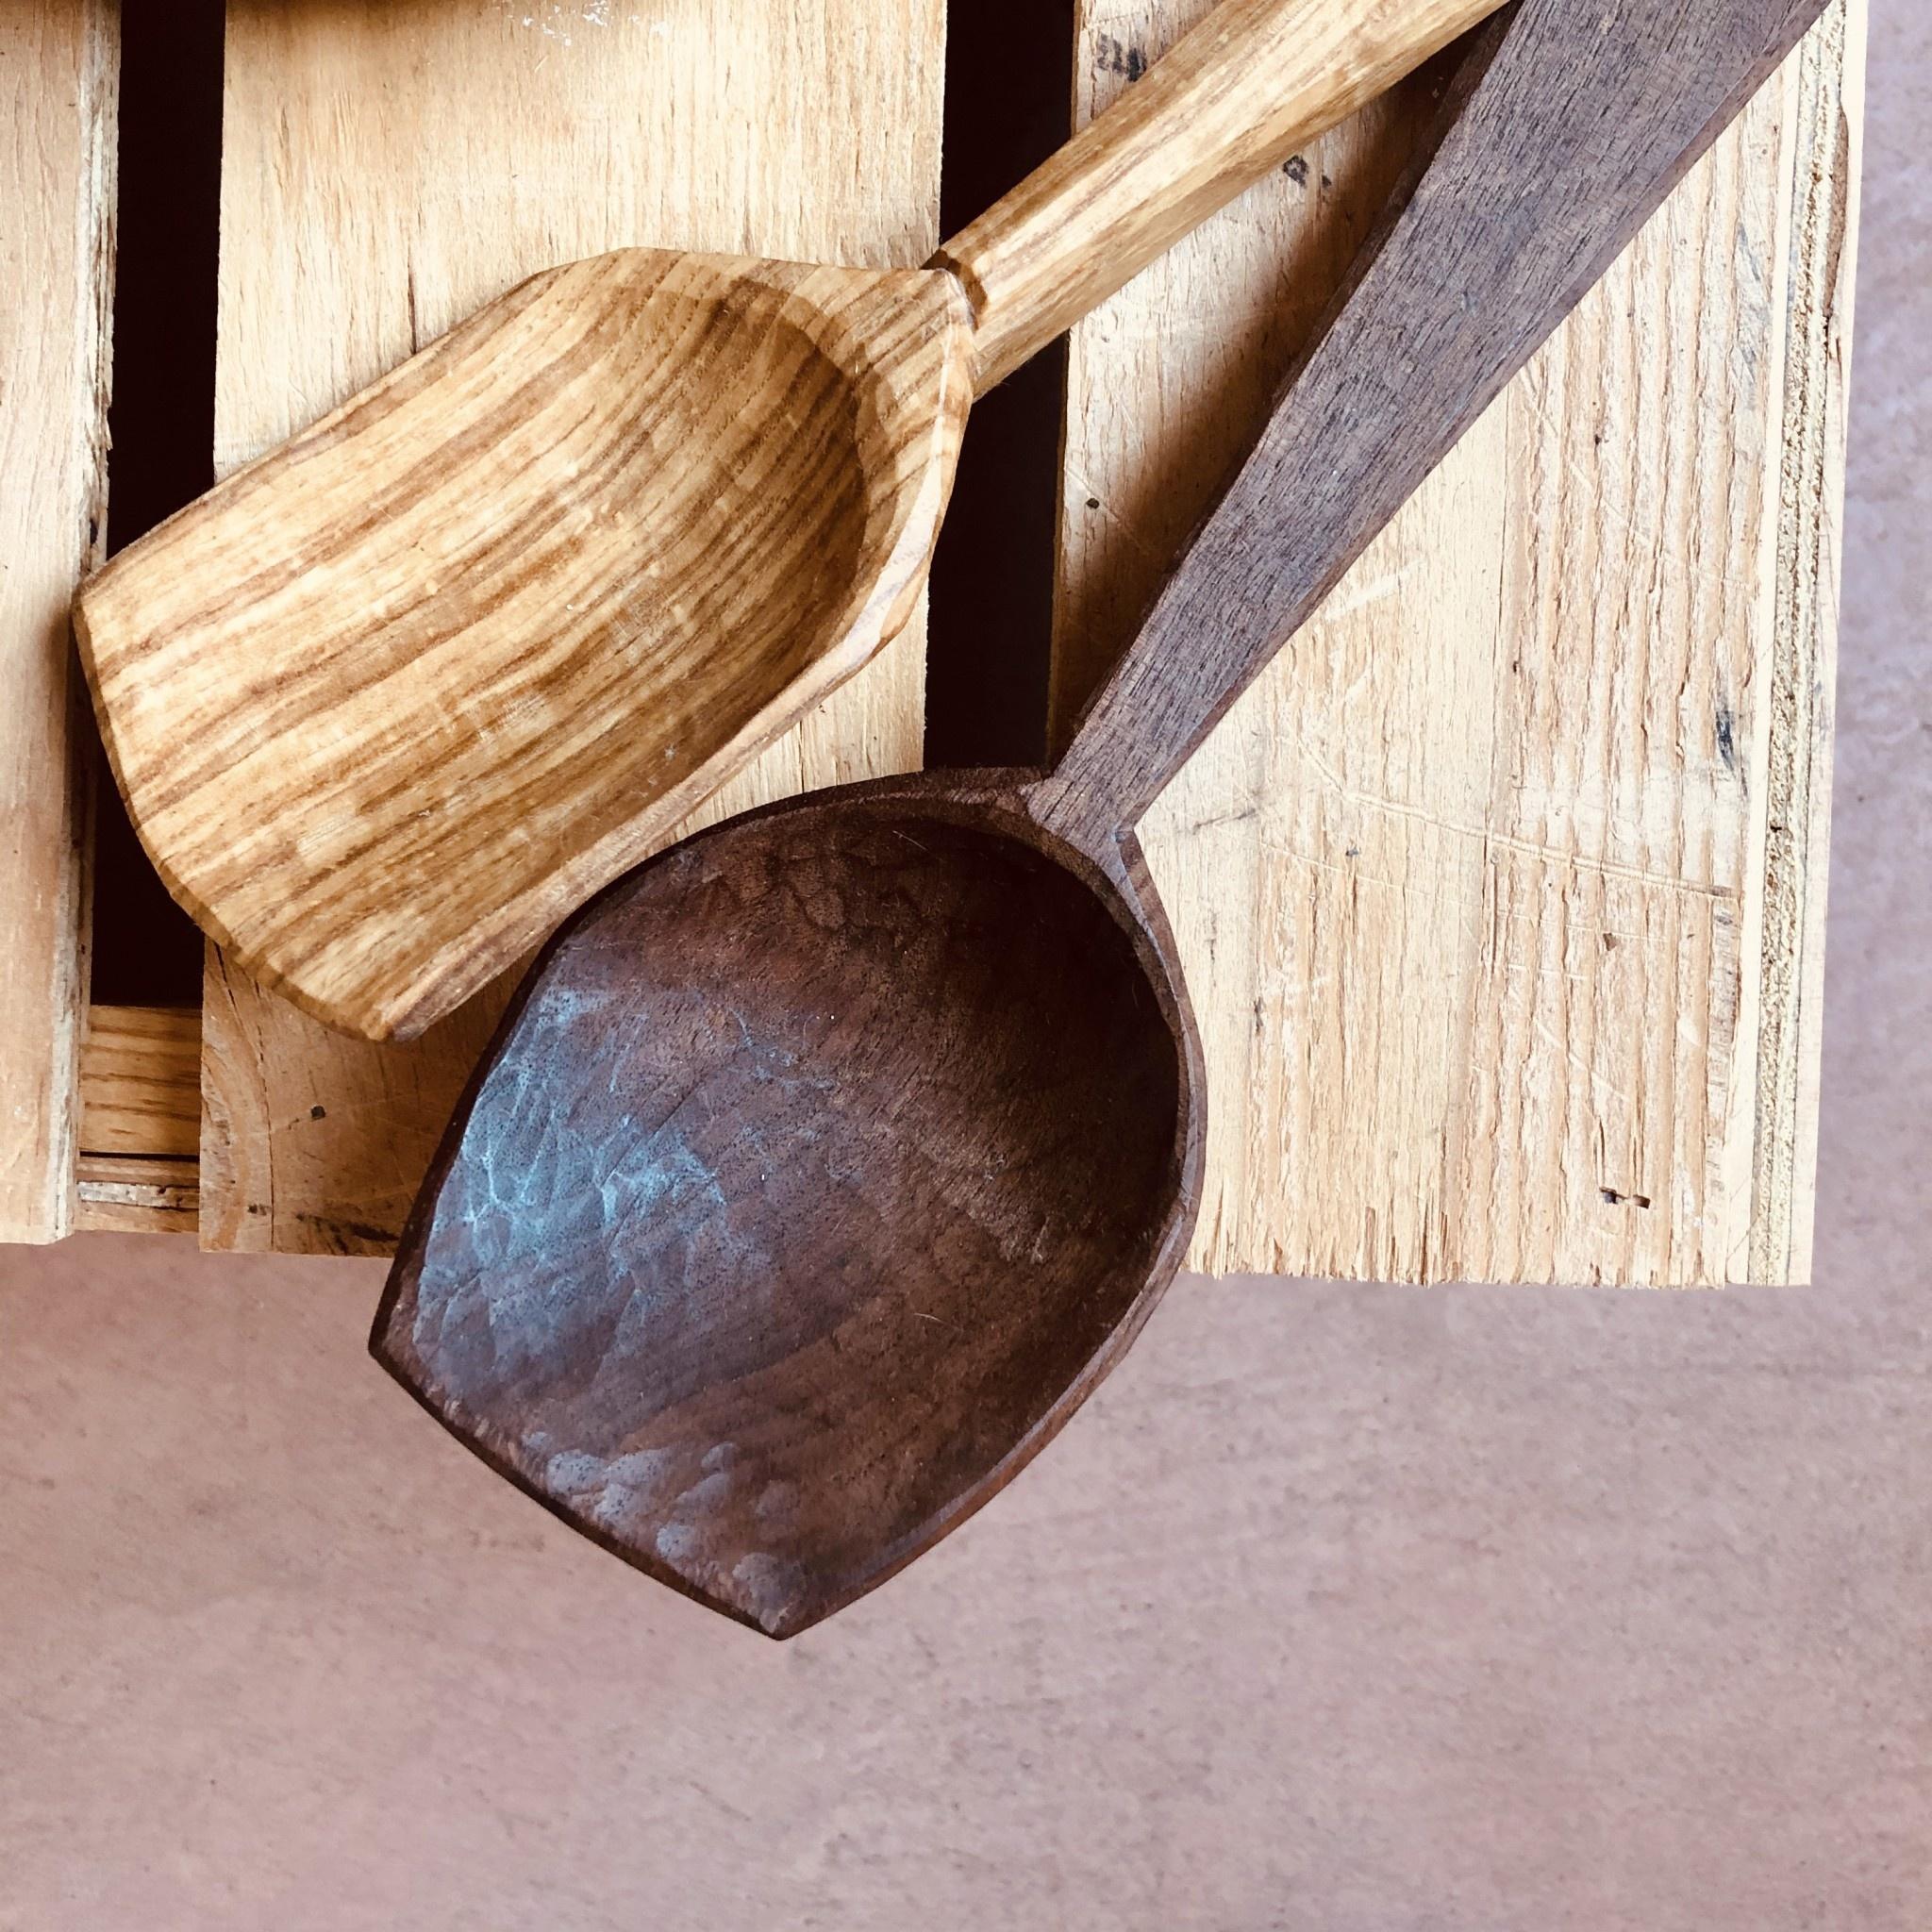 Three Acorns Three Acorns Walnut Cooking/Serving Spoon